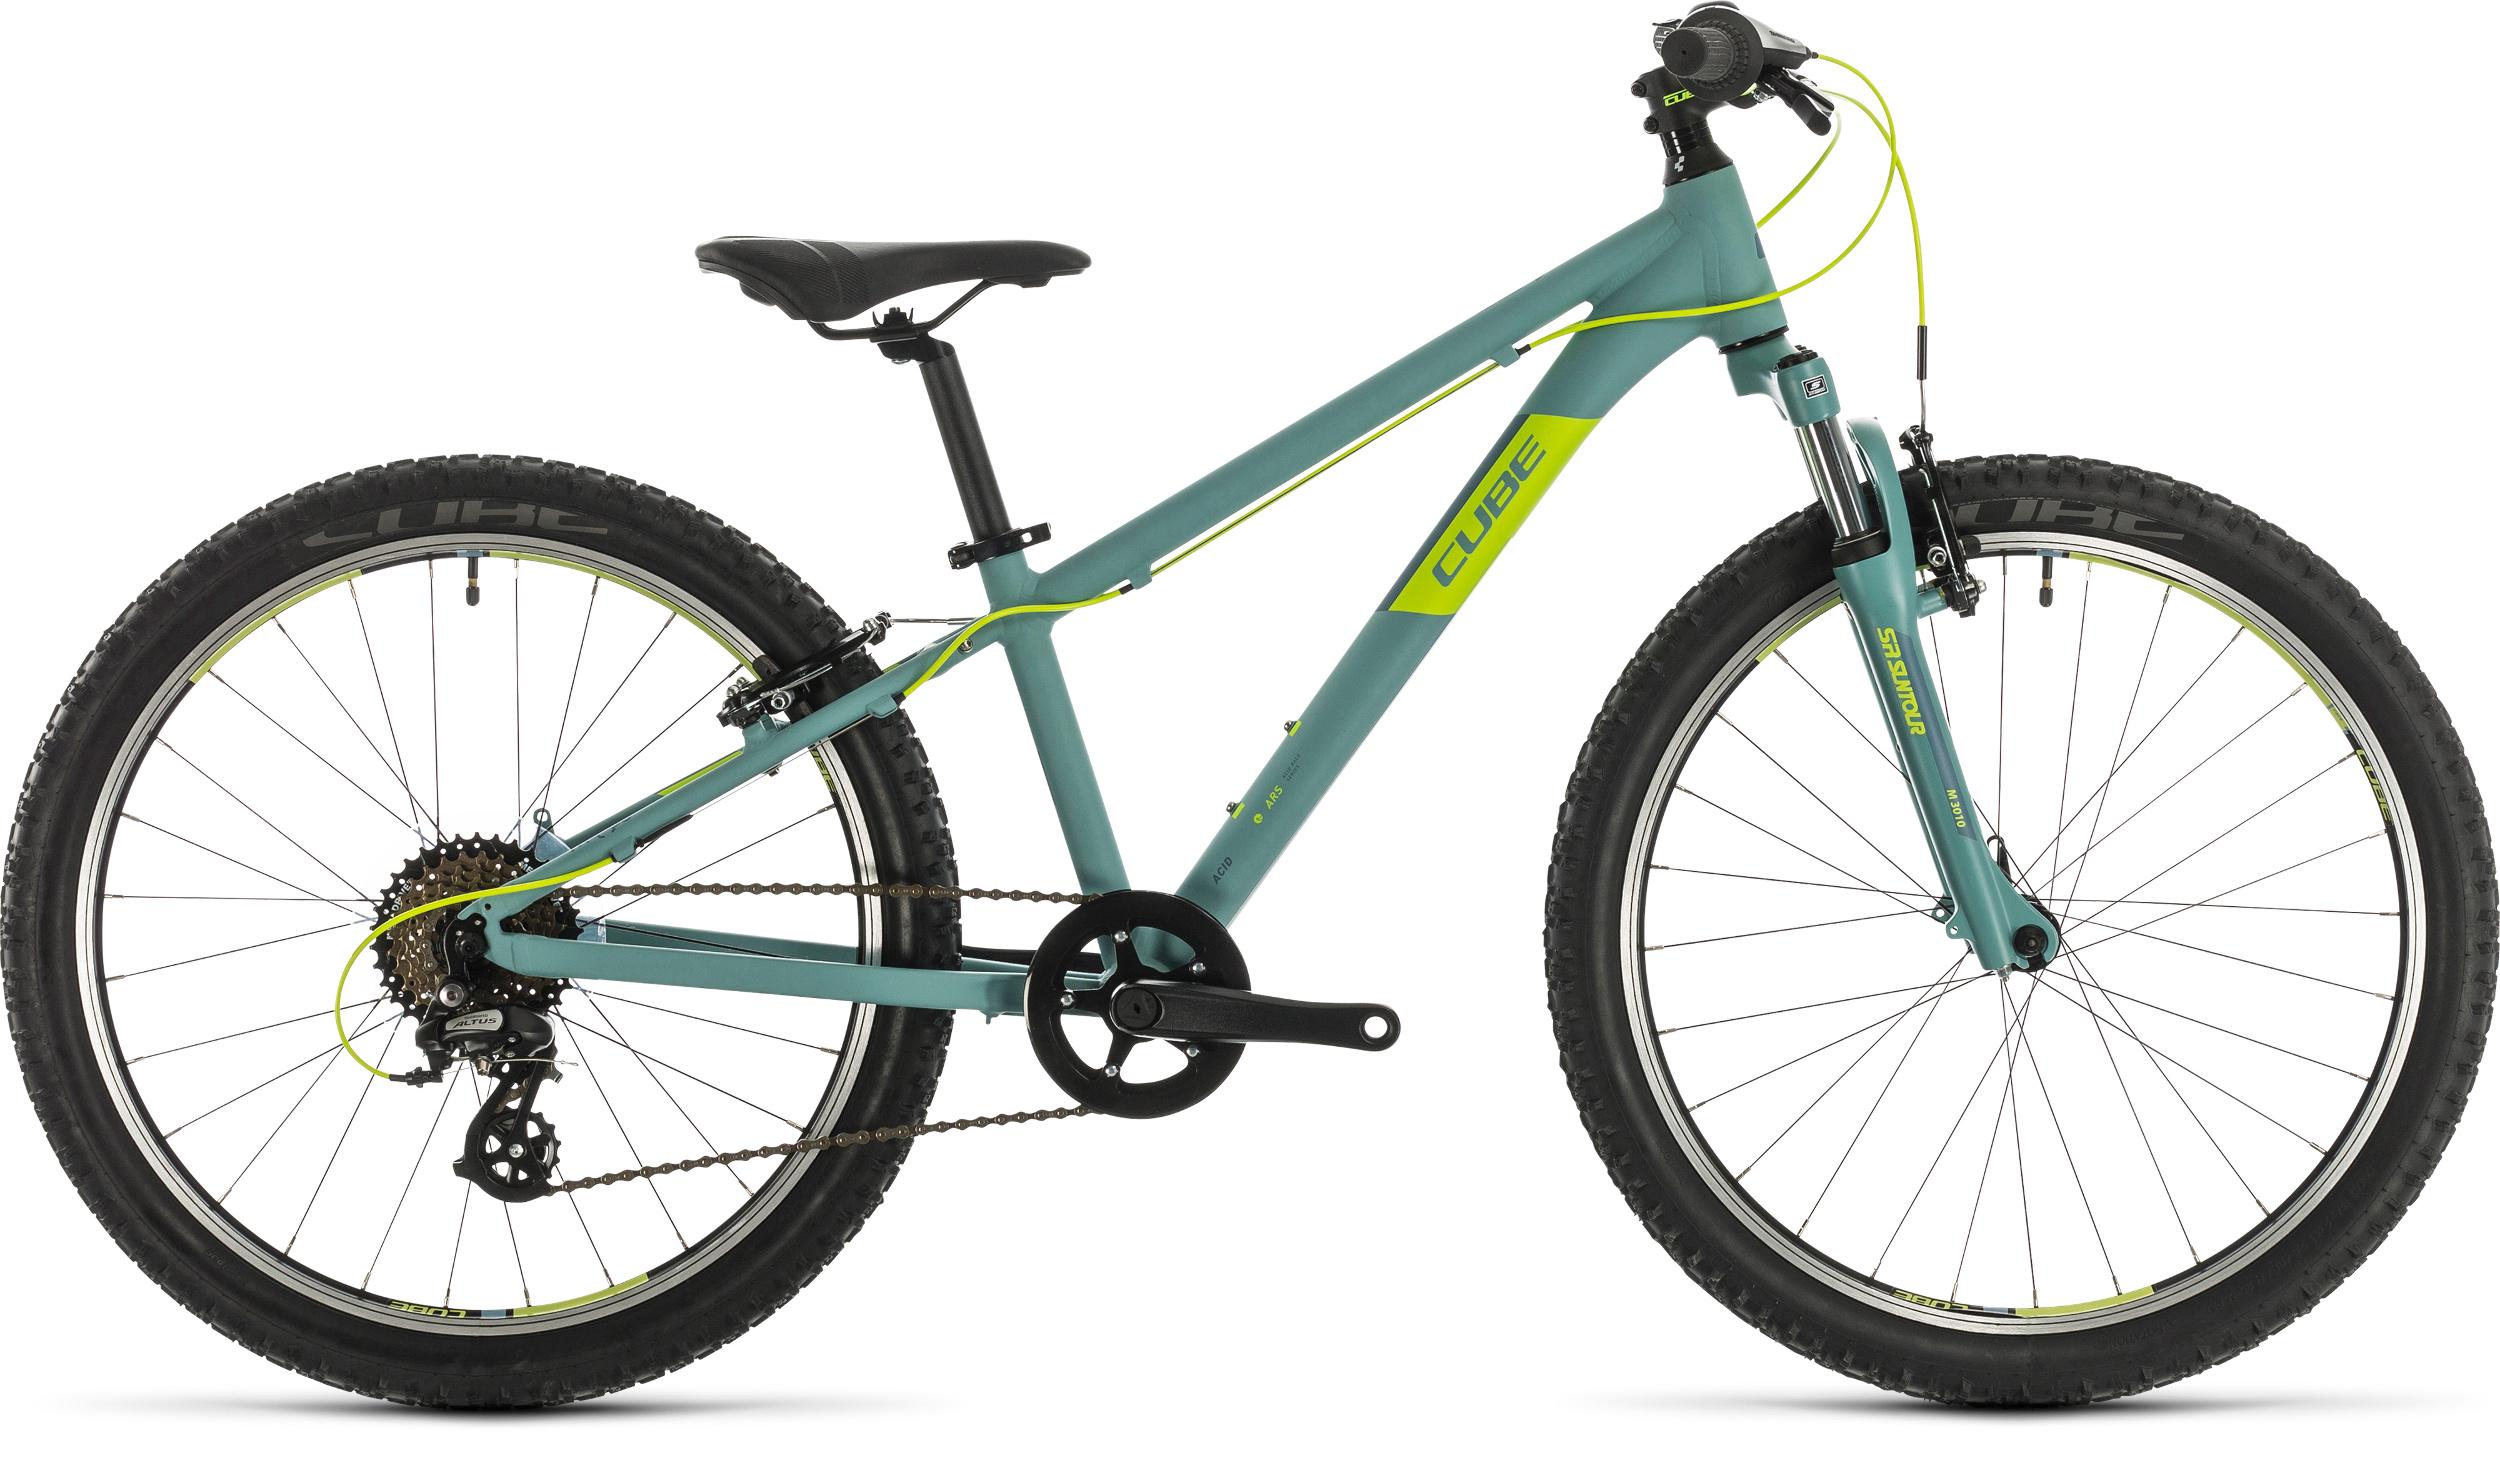 Cube Acid 240 24in Wheel Kids Bike 2020 Green/Lime